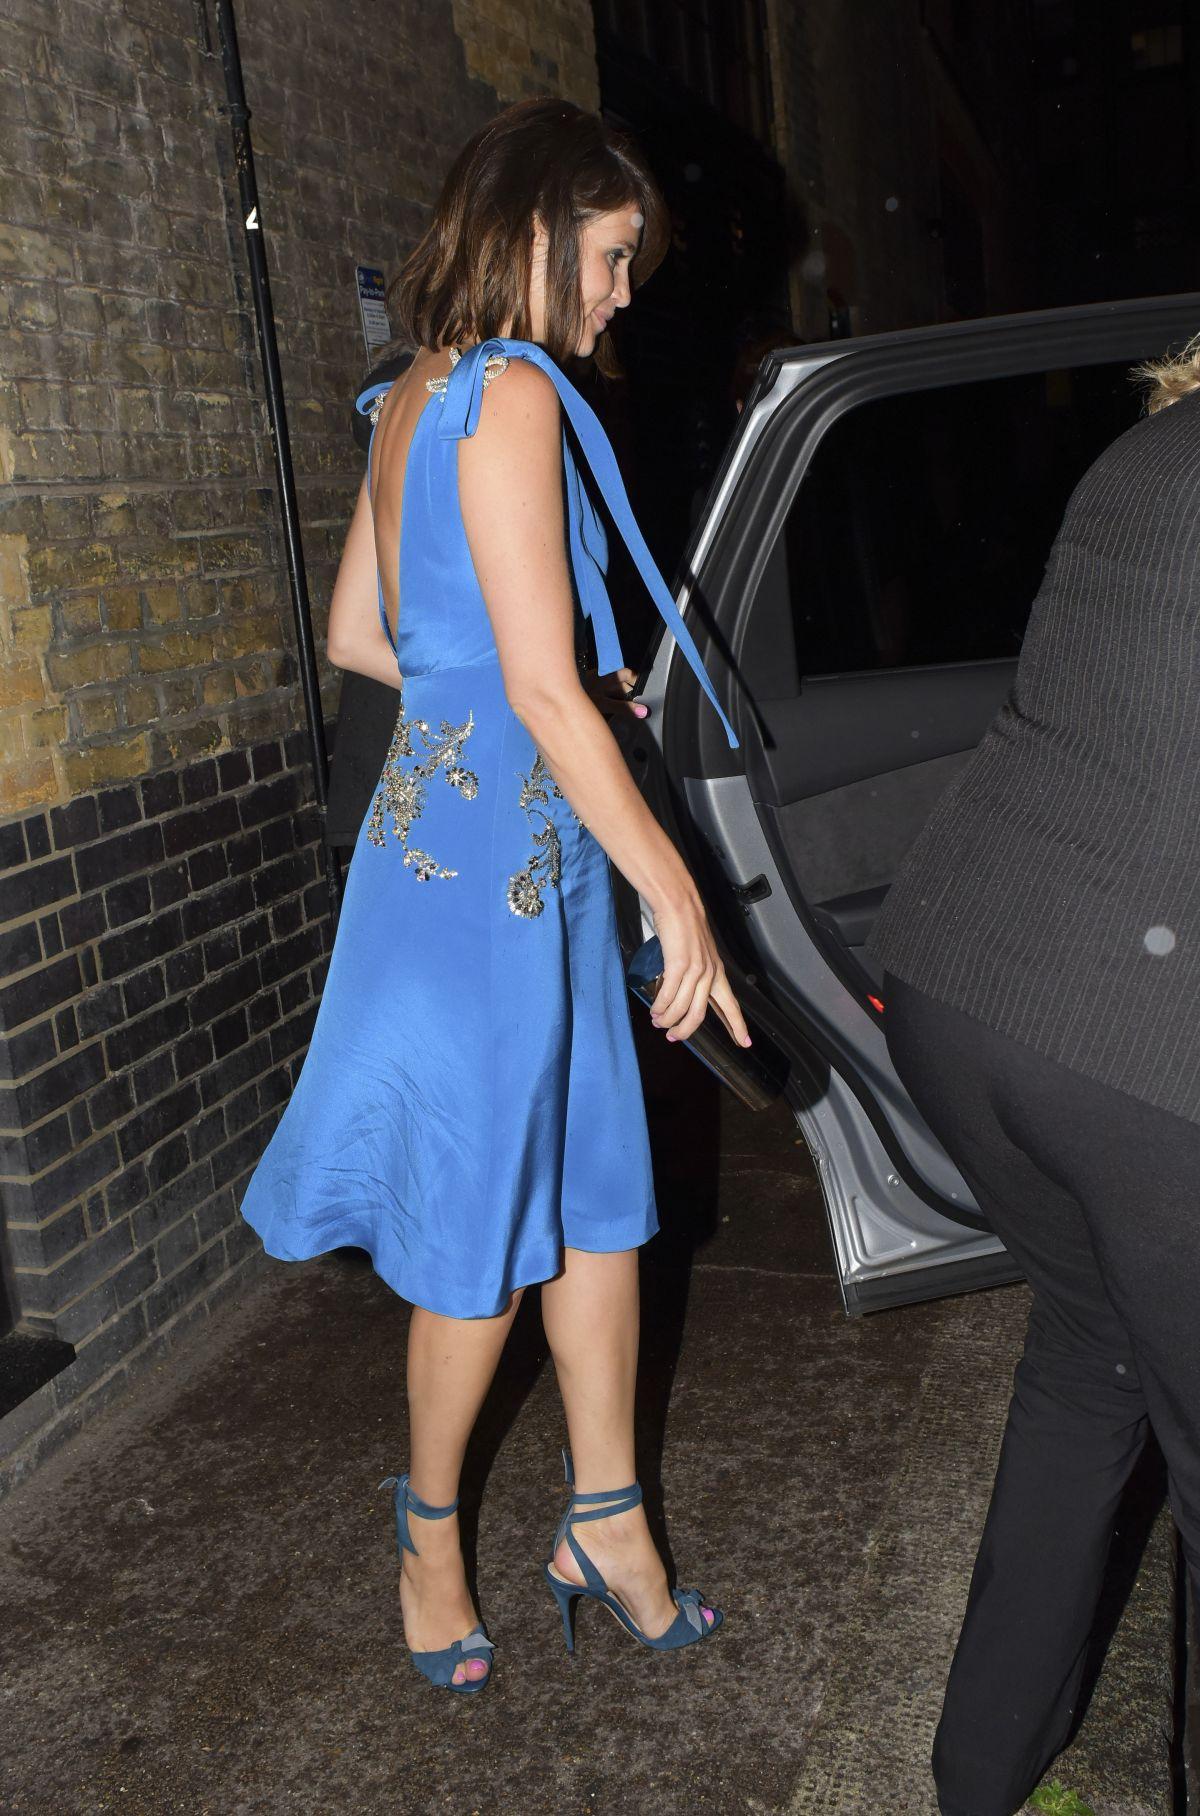 GEMMA ARTERTON Leaves Chiltern Firehouse in London 06/08/2016